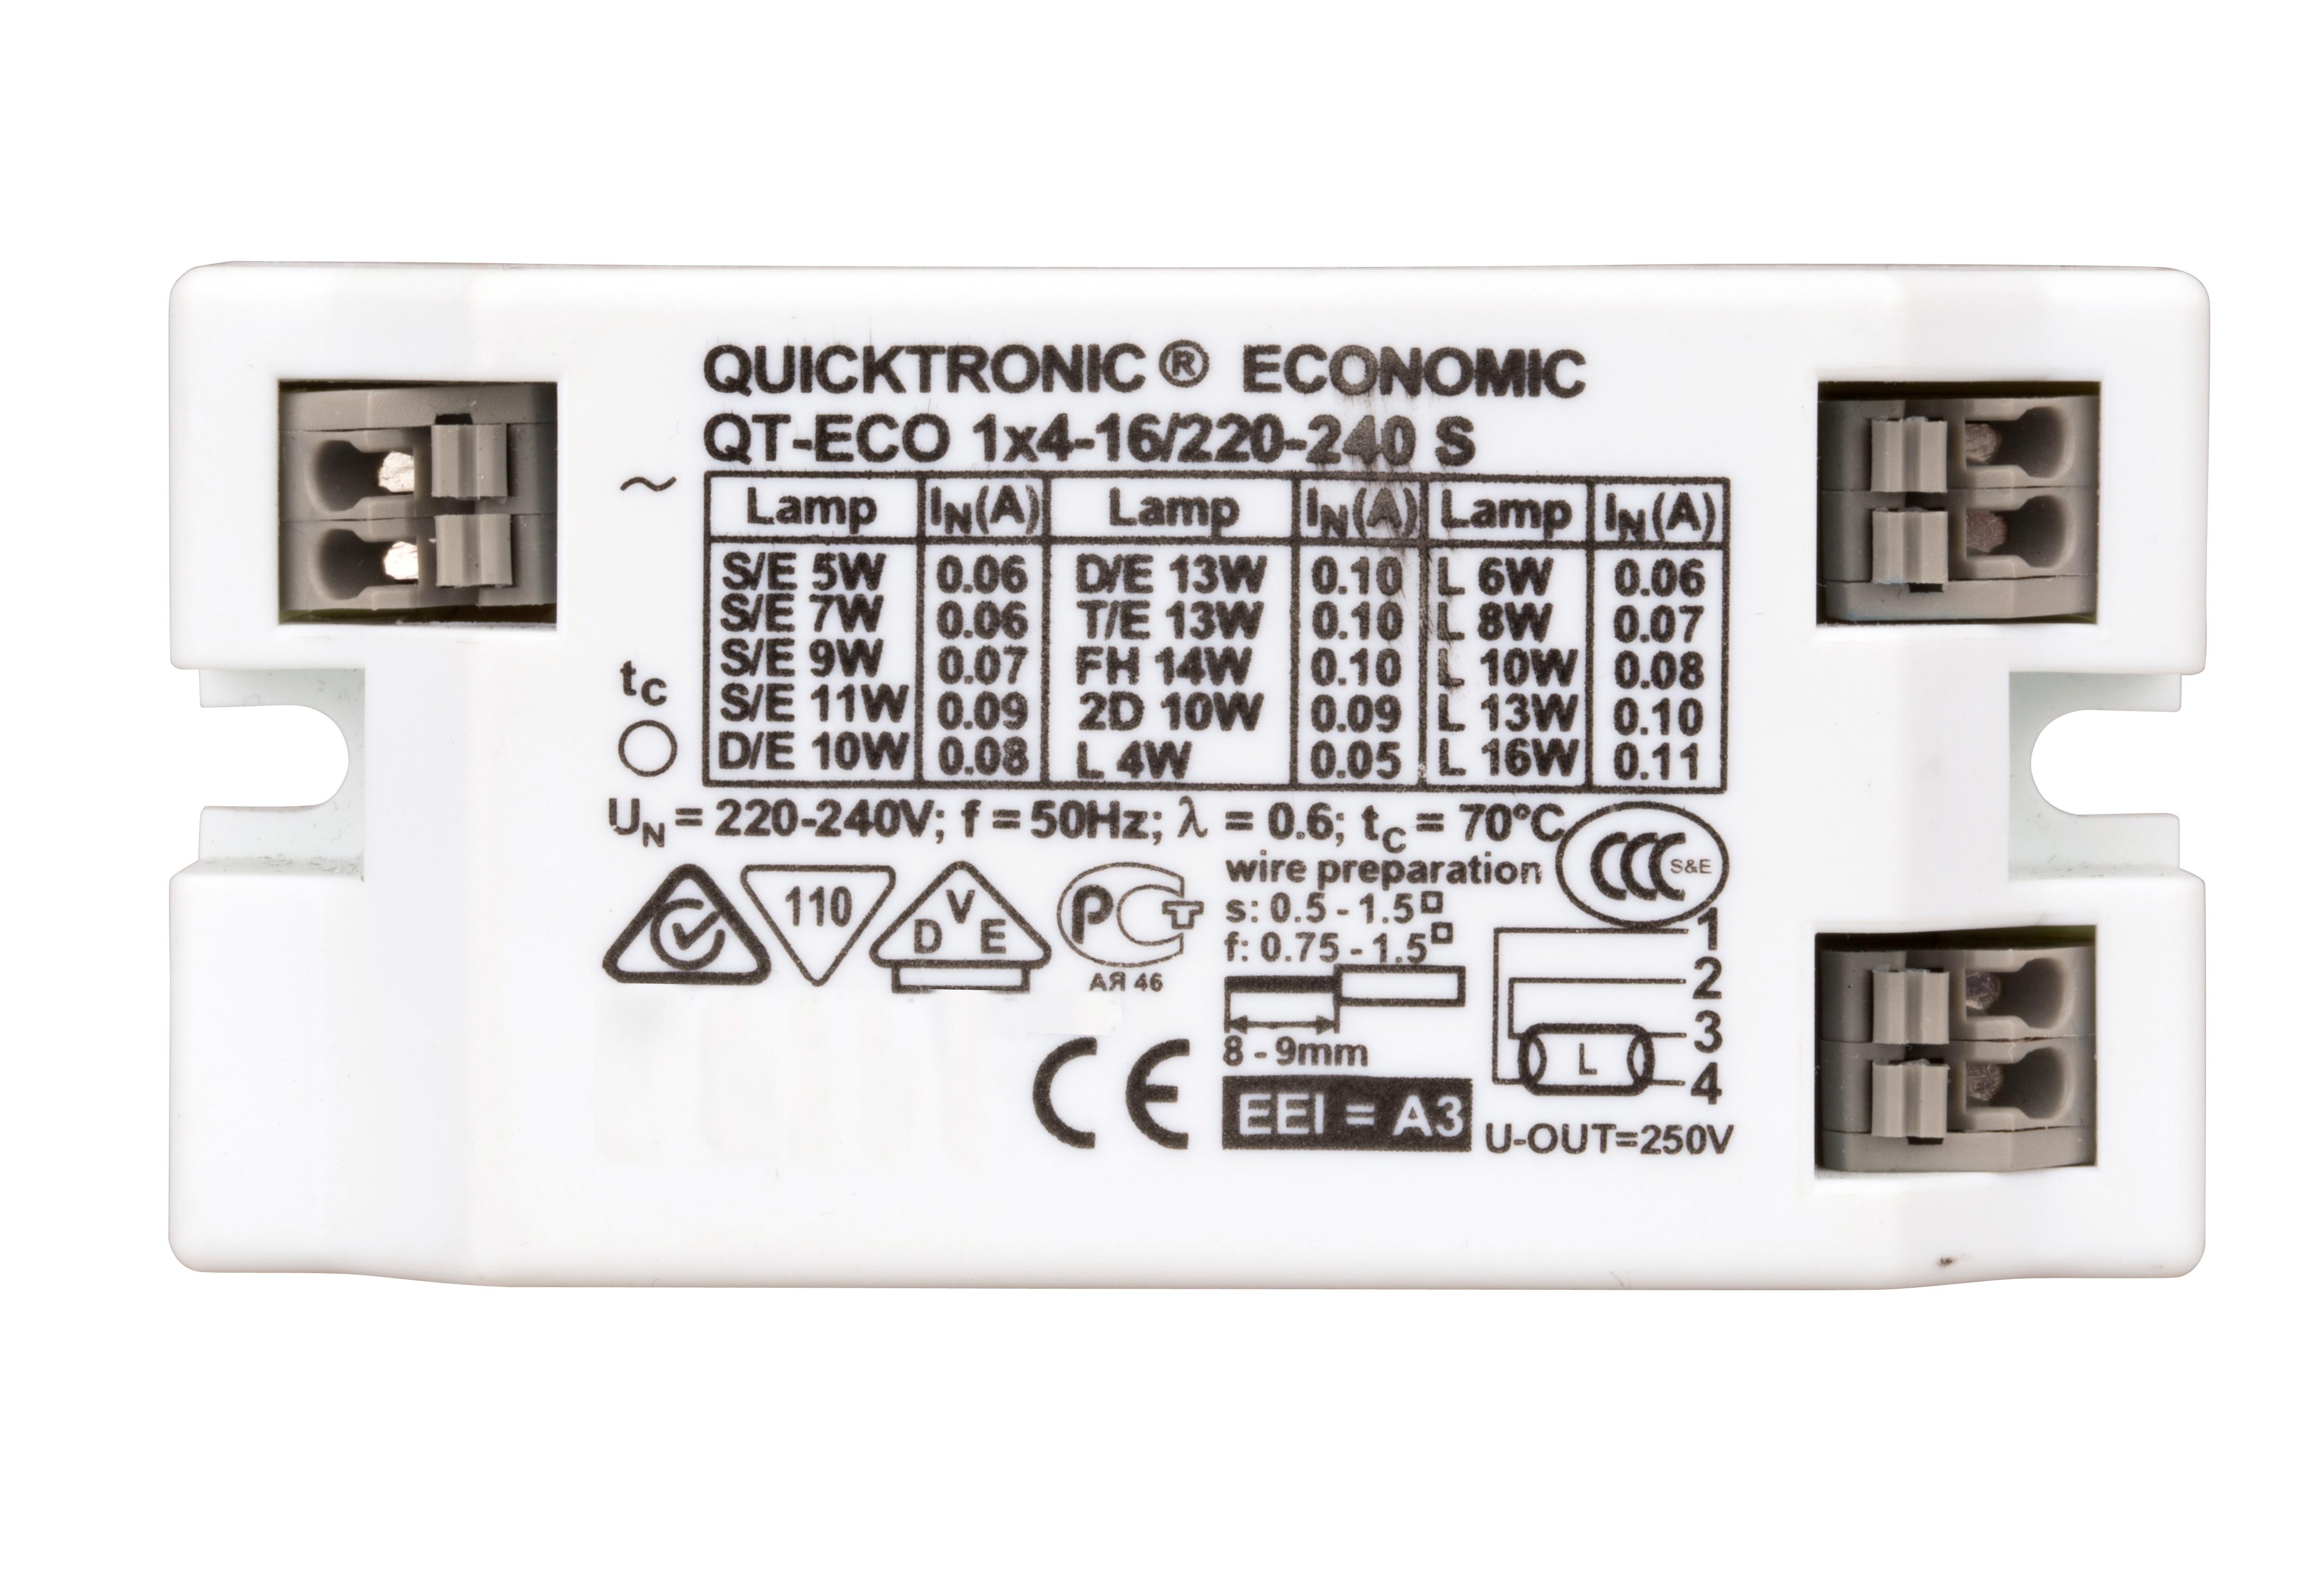 1 Stk EVG 6,5-16W / 230V AC/DC NLIEB104--